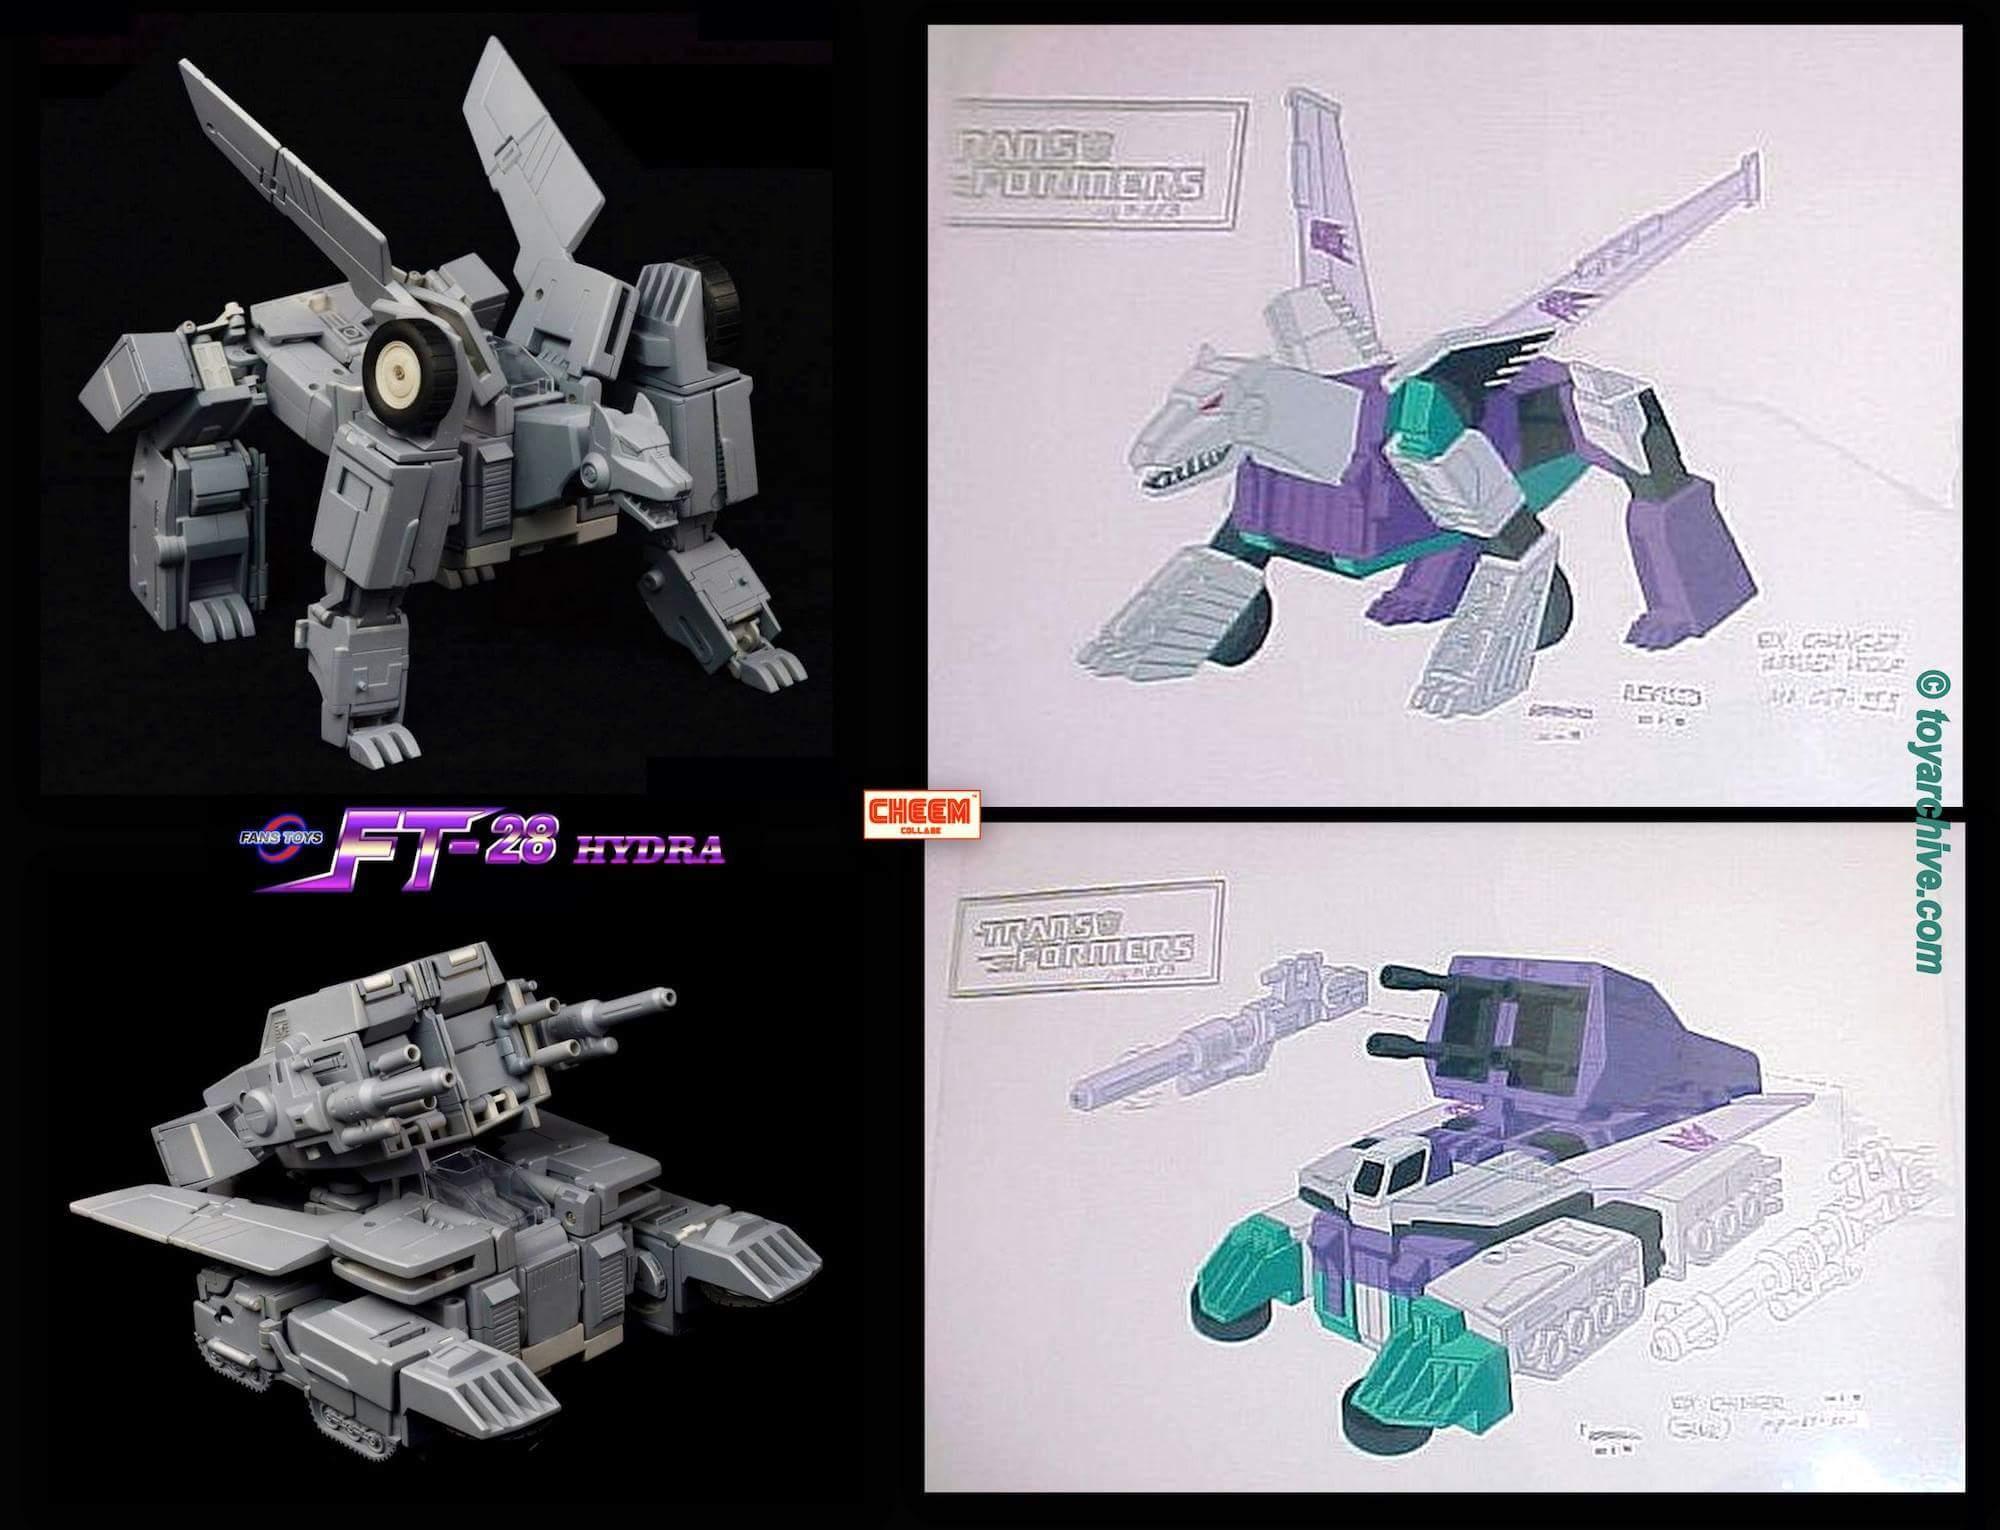 [Fanstoys] Produit Tiers - Jouet FT-28 Hydra aka Sixshot/Hexabot Bb1pJnLQ